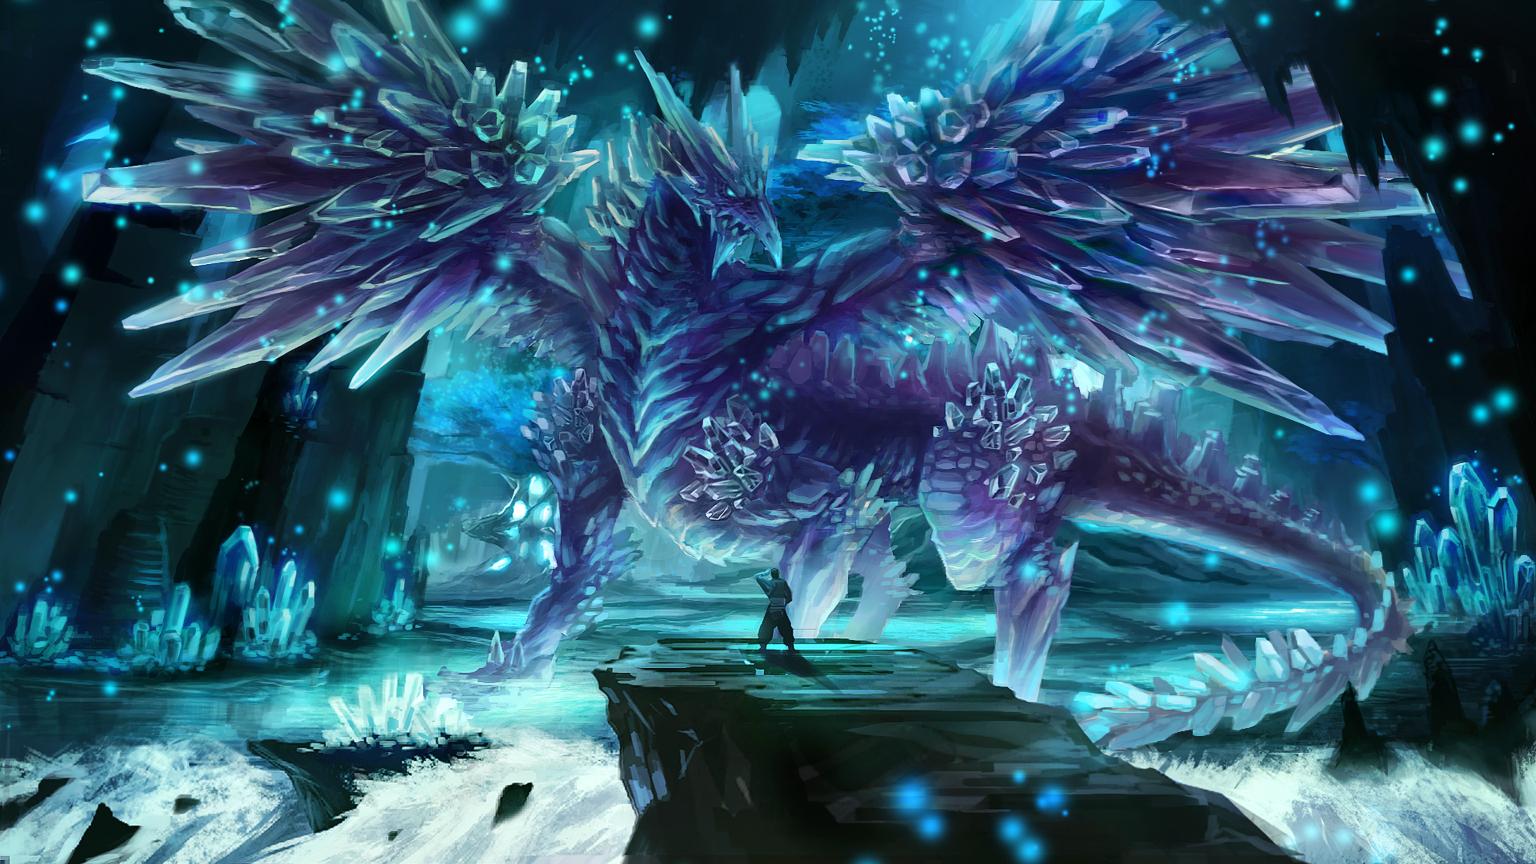 fairy tail wallpaper dragon slayer